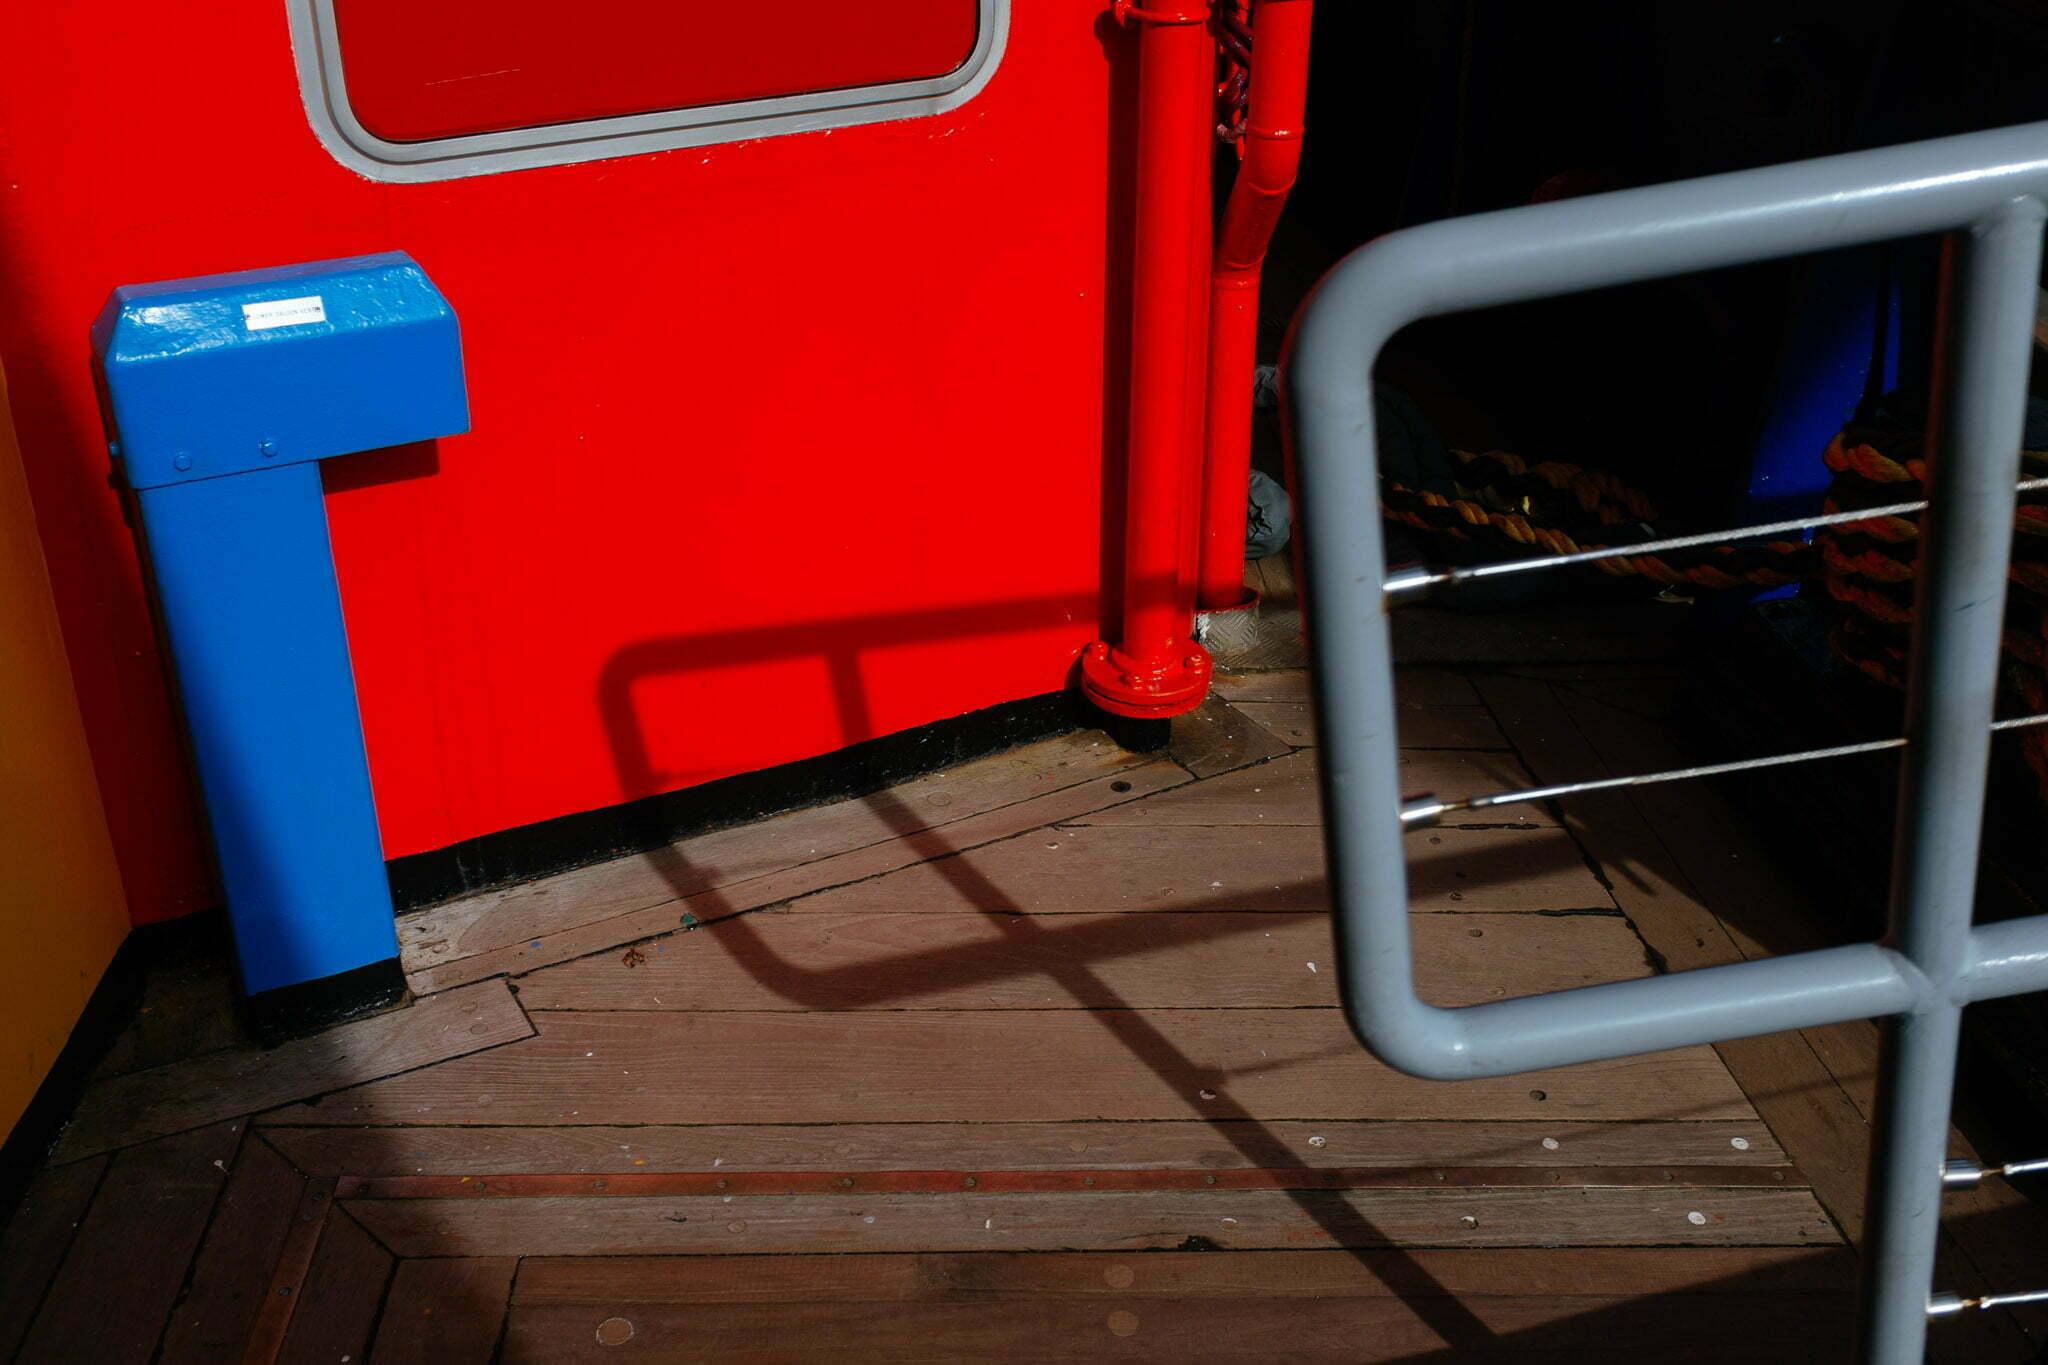 dazzle-ferry-liverpool-6314